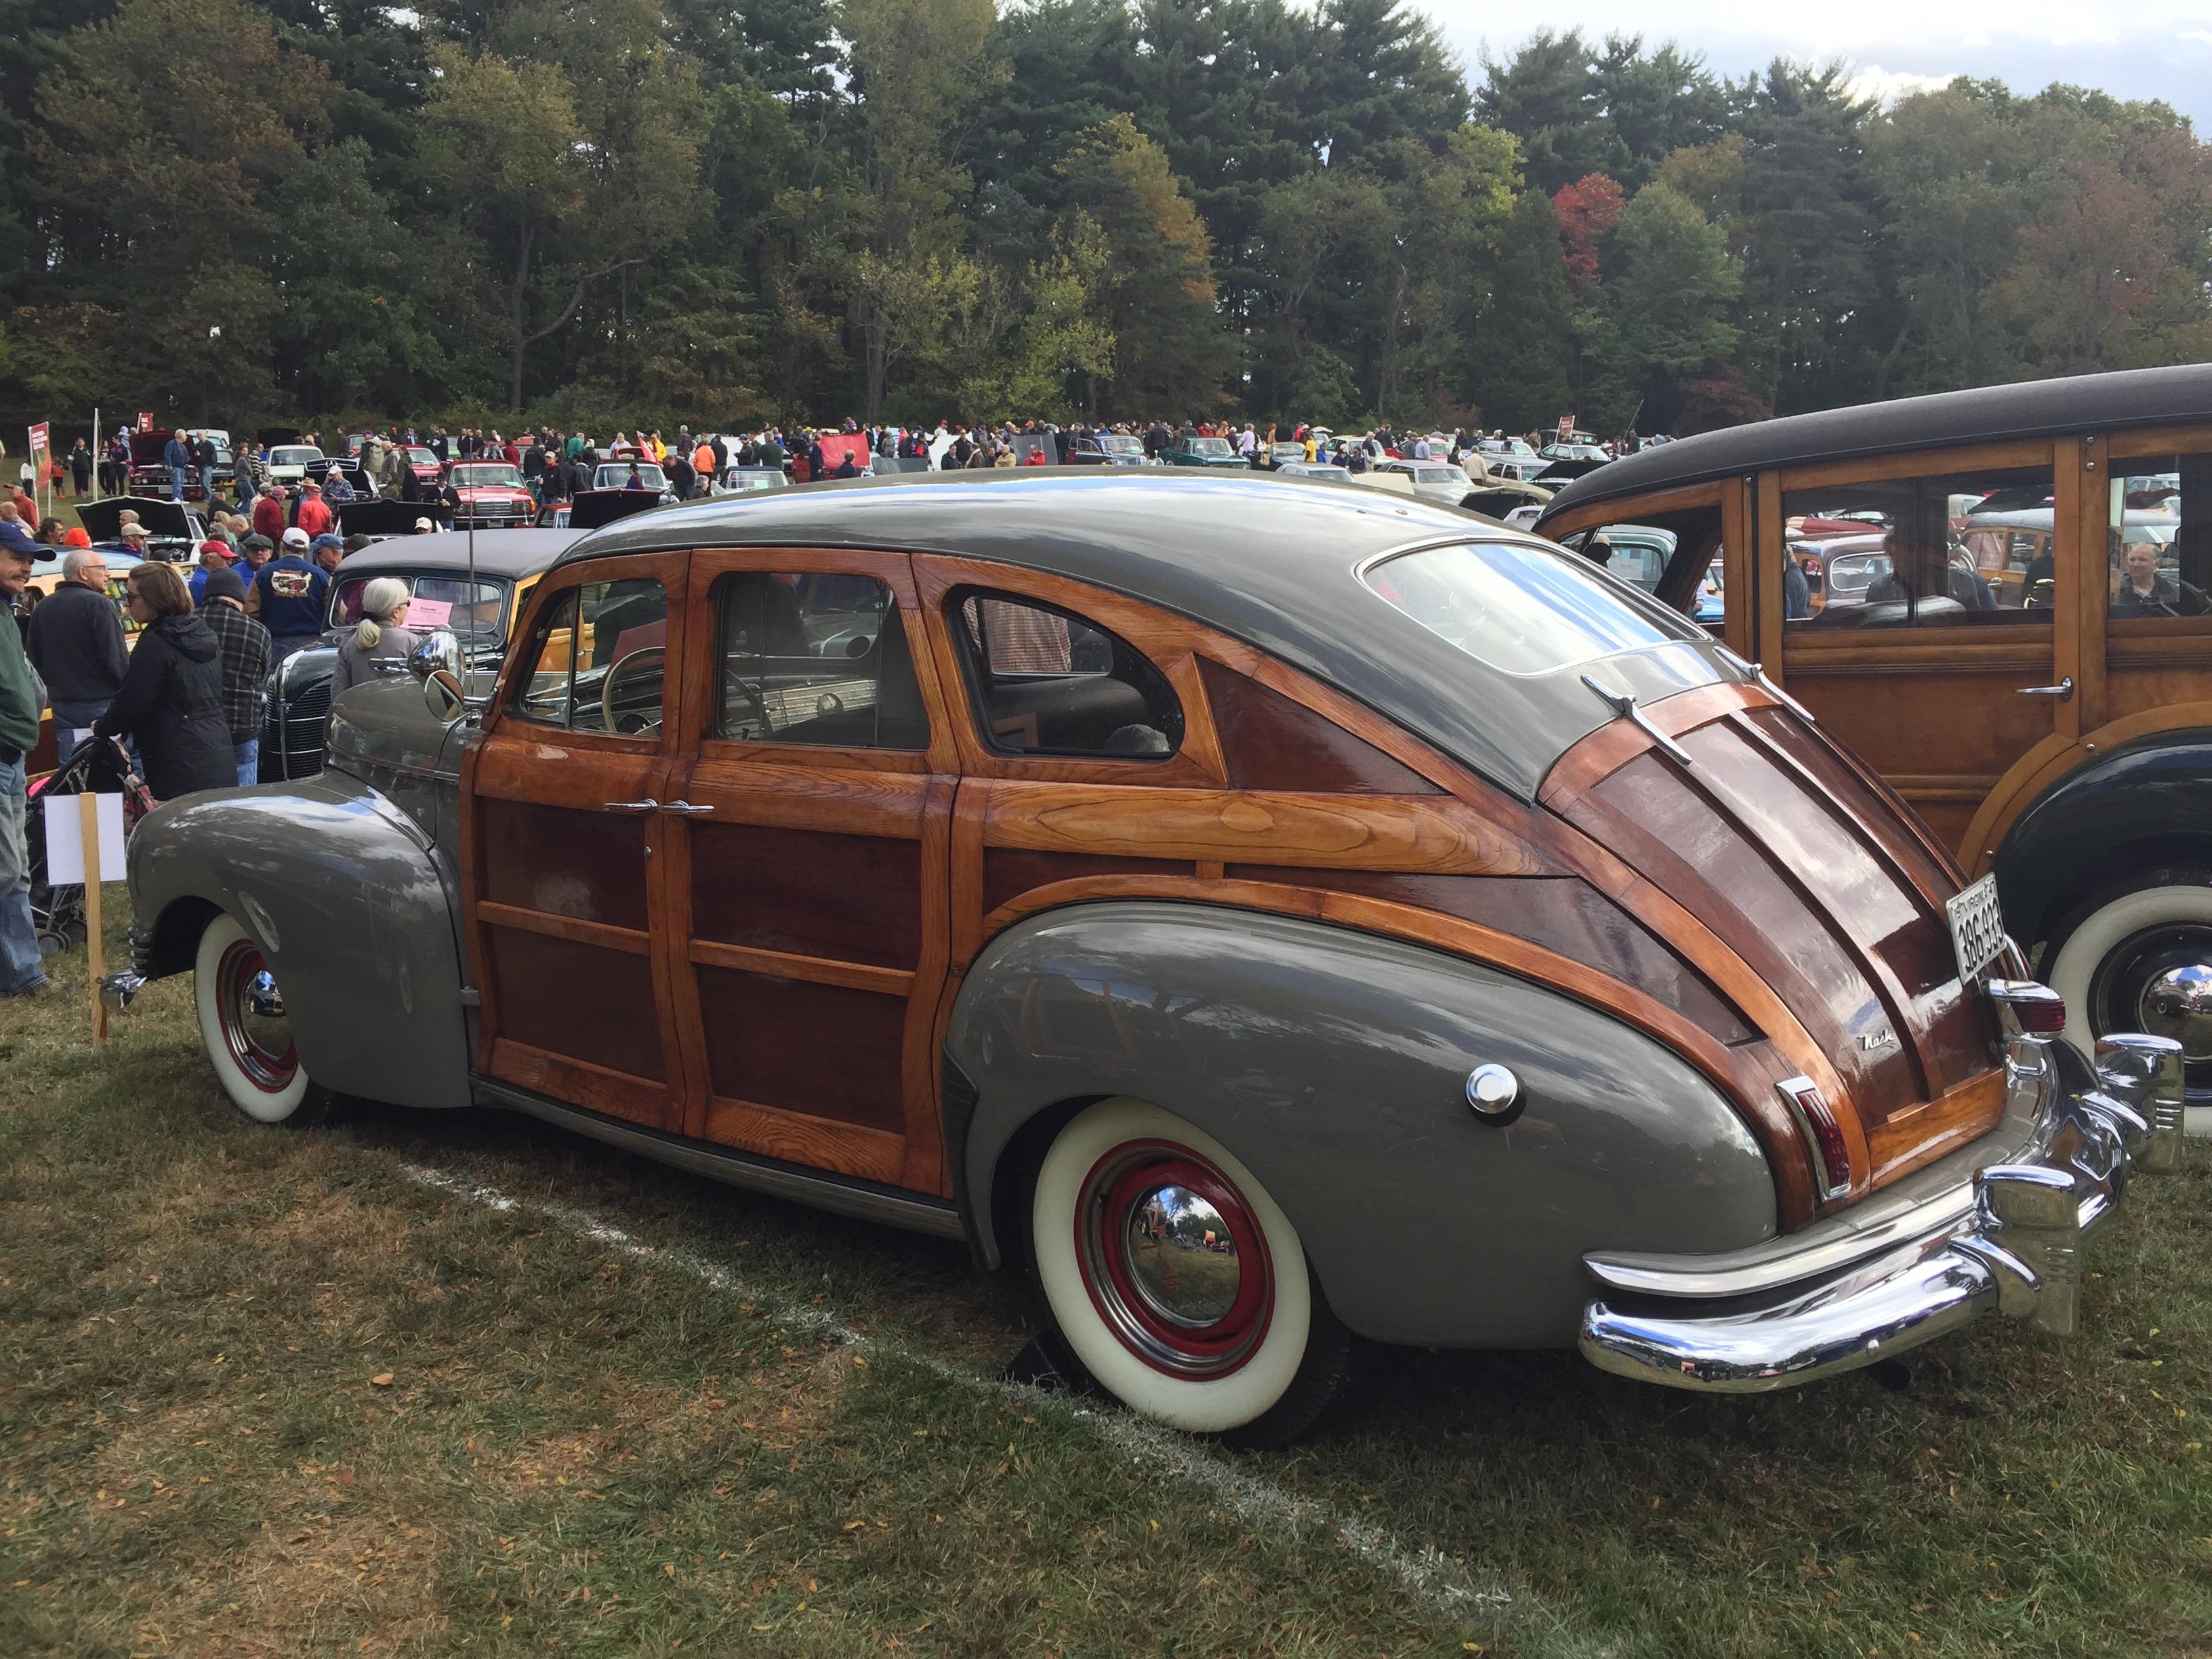 File:1946 Nash Ambassador Suburban woody fastback at 2015 Rockville